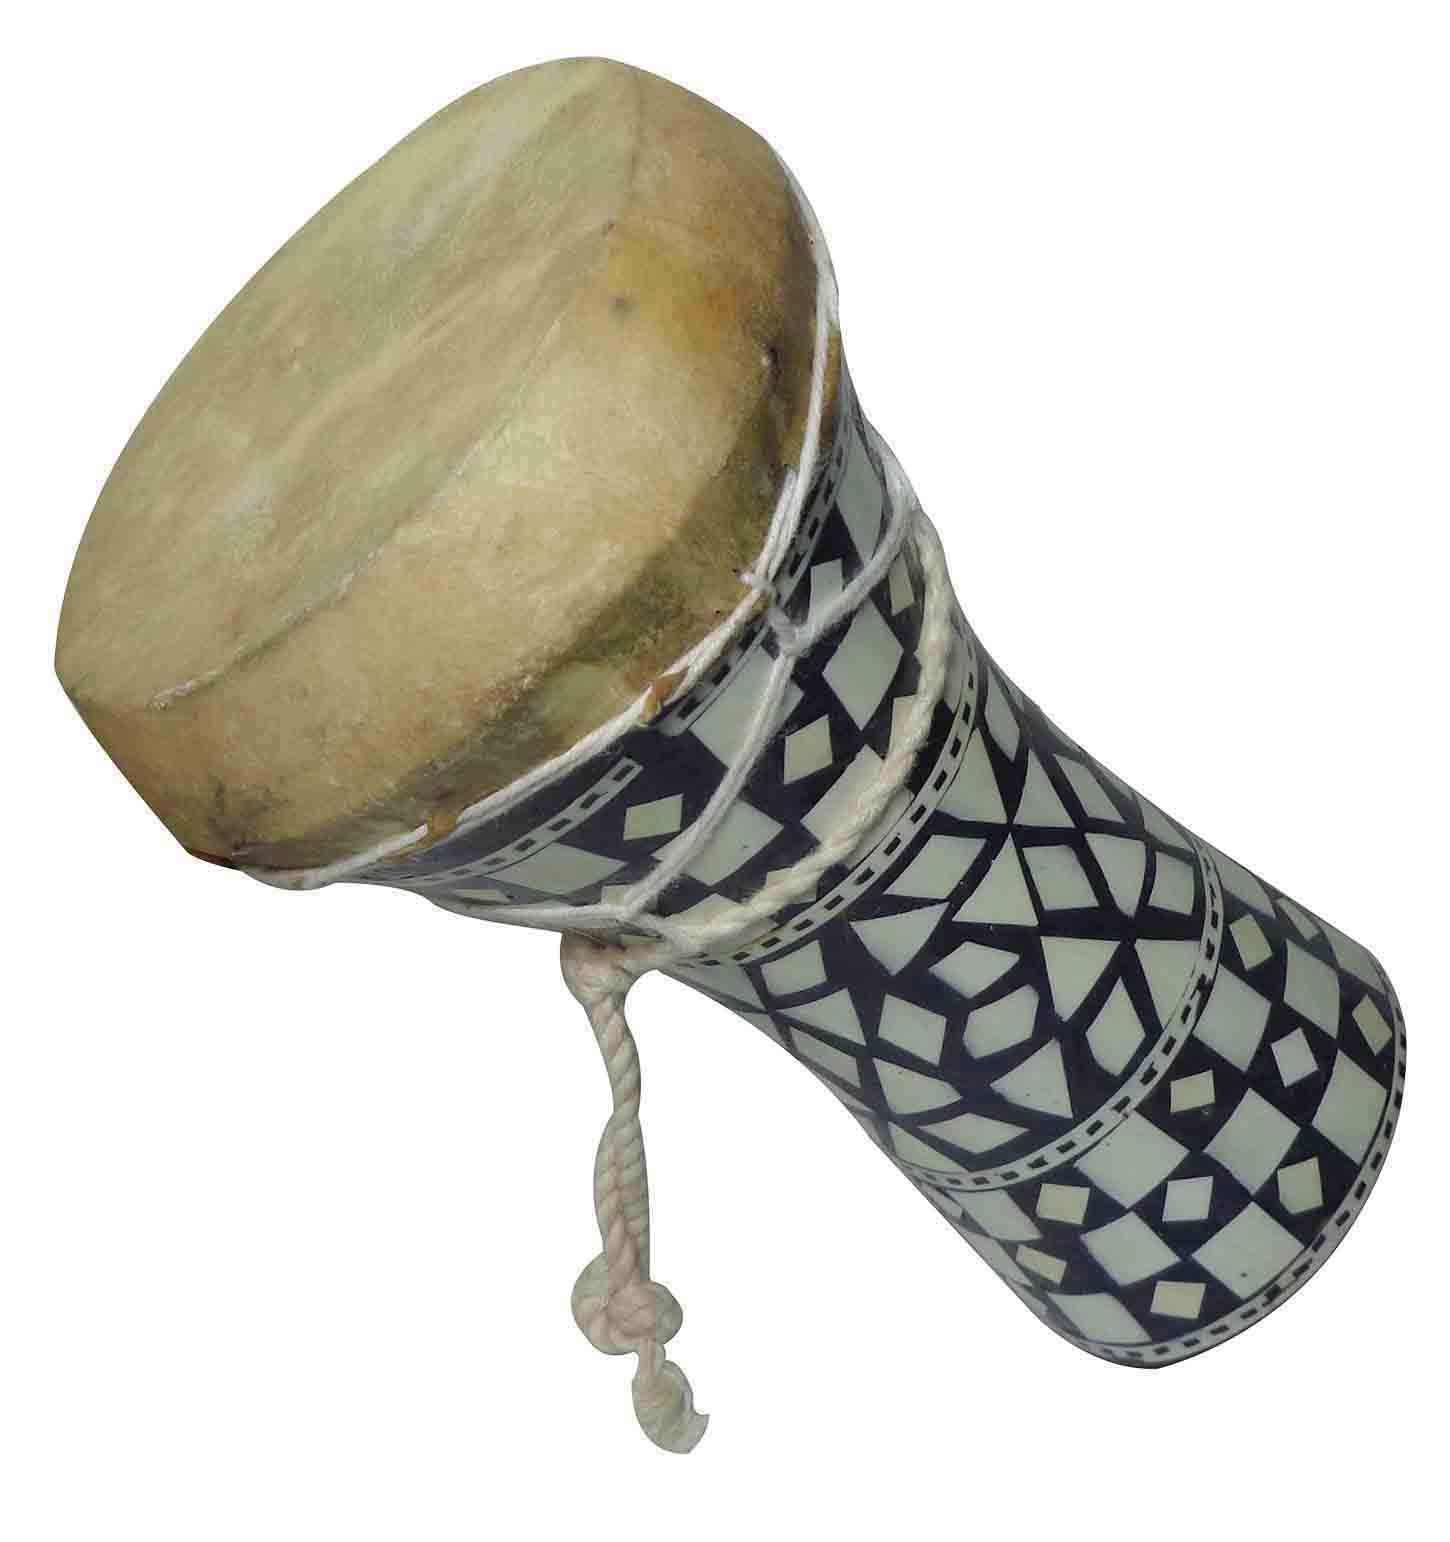 1pcs Small Egyptian Wooden Tabla Drum Doumbek Goat Skin Mosaic 6'' Handmade (425) by bonballoon